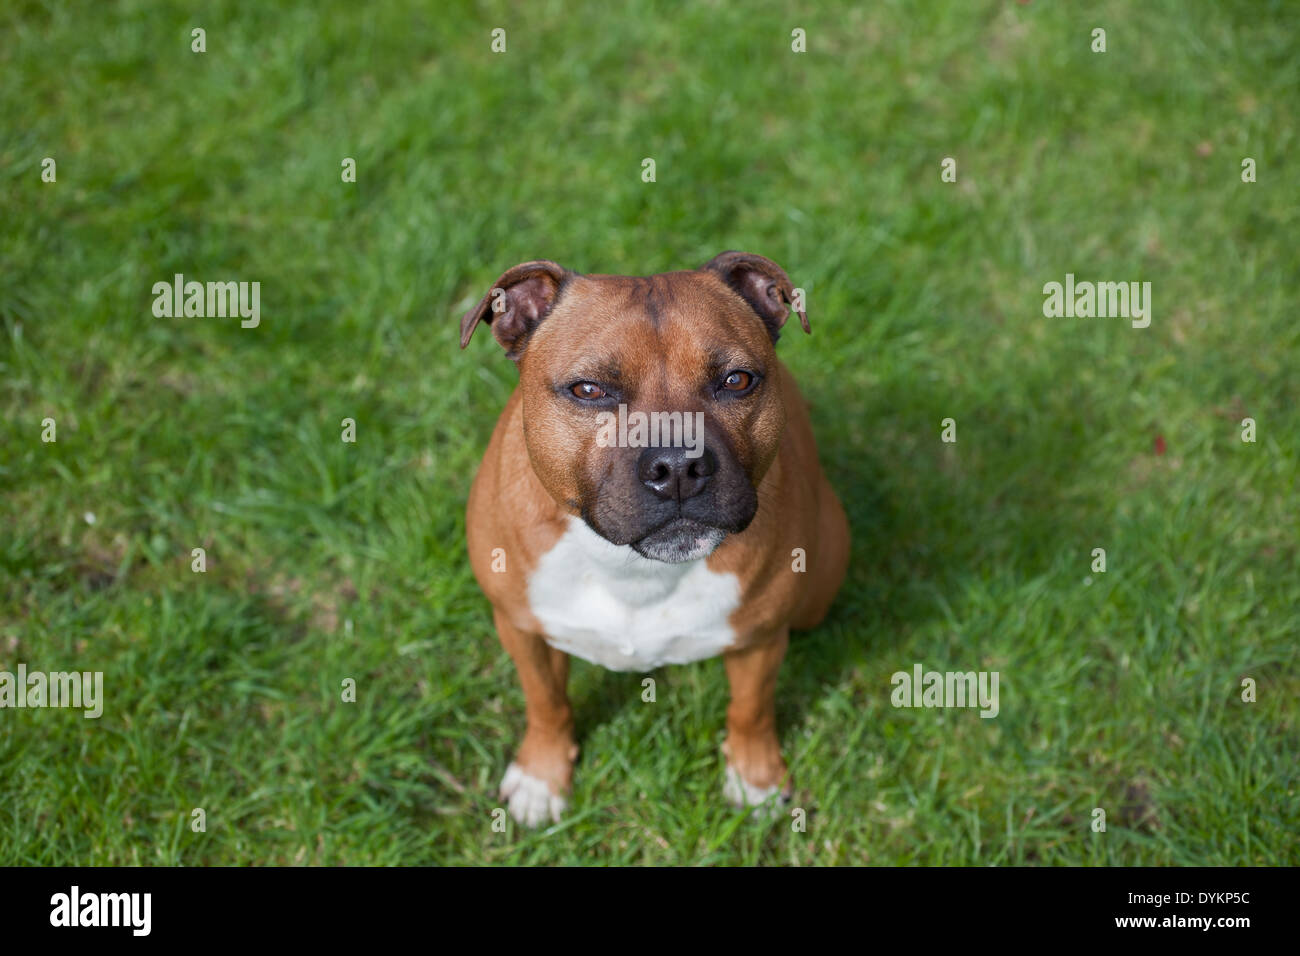 Staffordshire Bullterrier - Stock Image